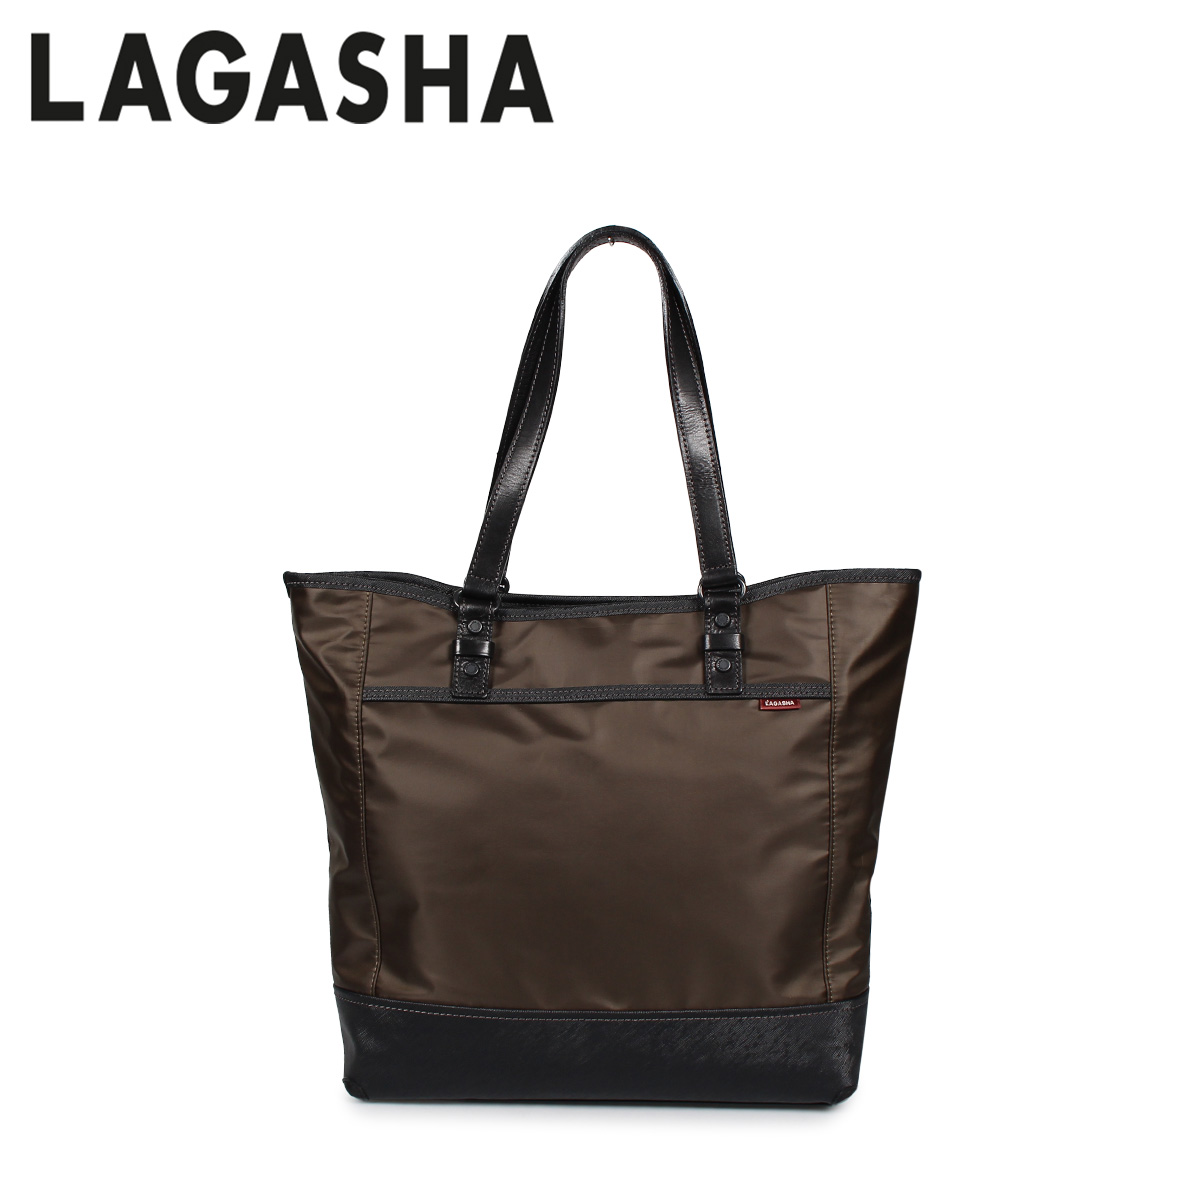 LAGASHA UPLIGHT ラガシャ アップライト バッグ トートバッグ メンズ カーキ 7228